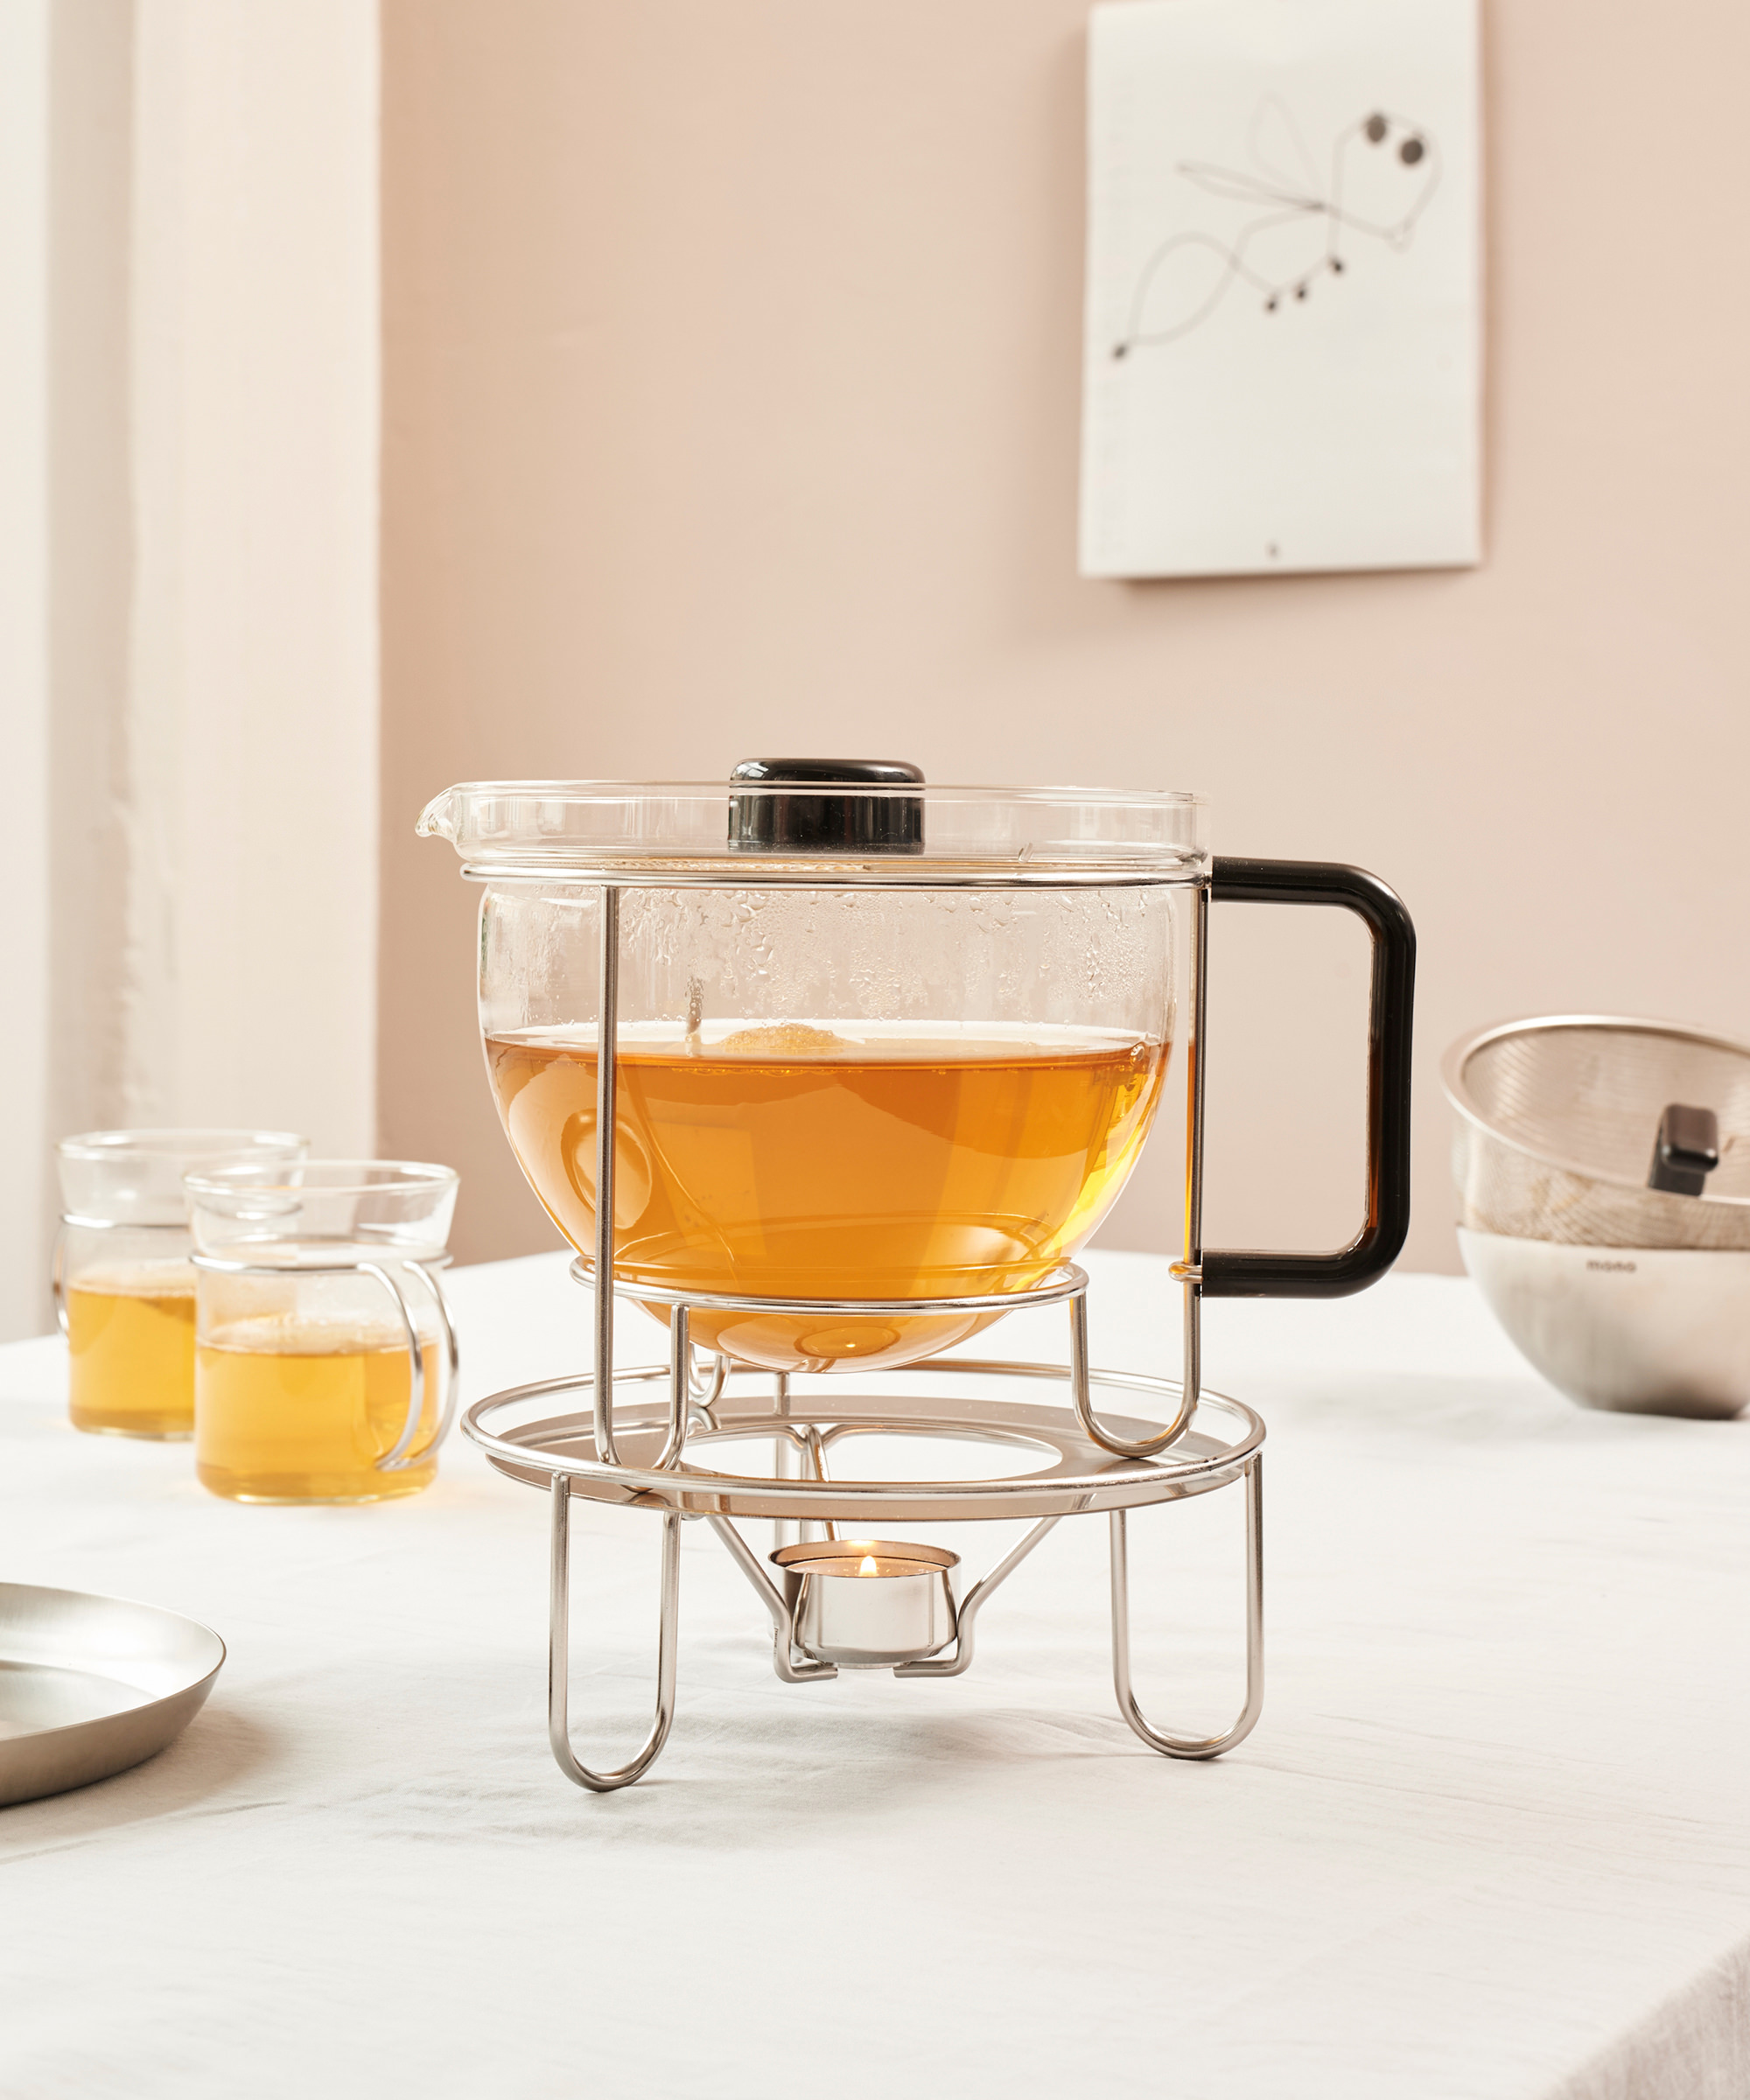 10450 Mono Classic Teekanne Teapot 01